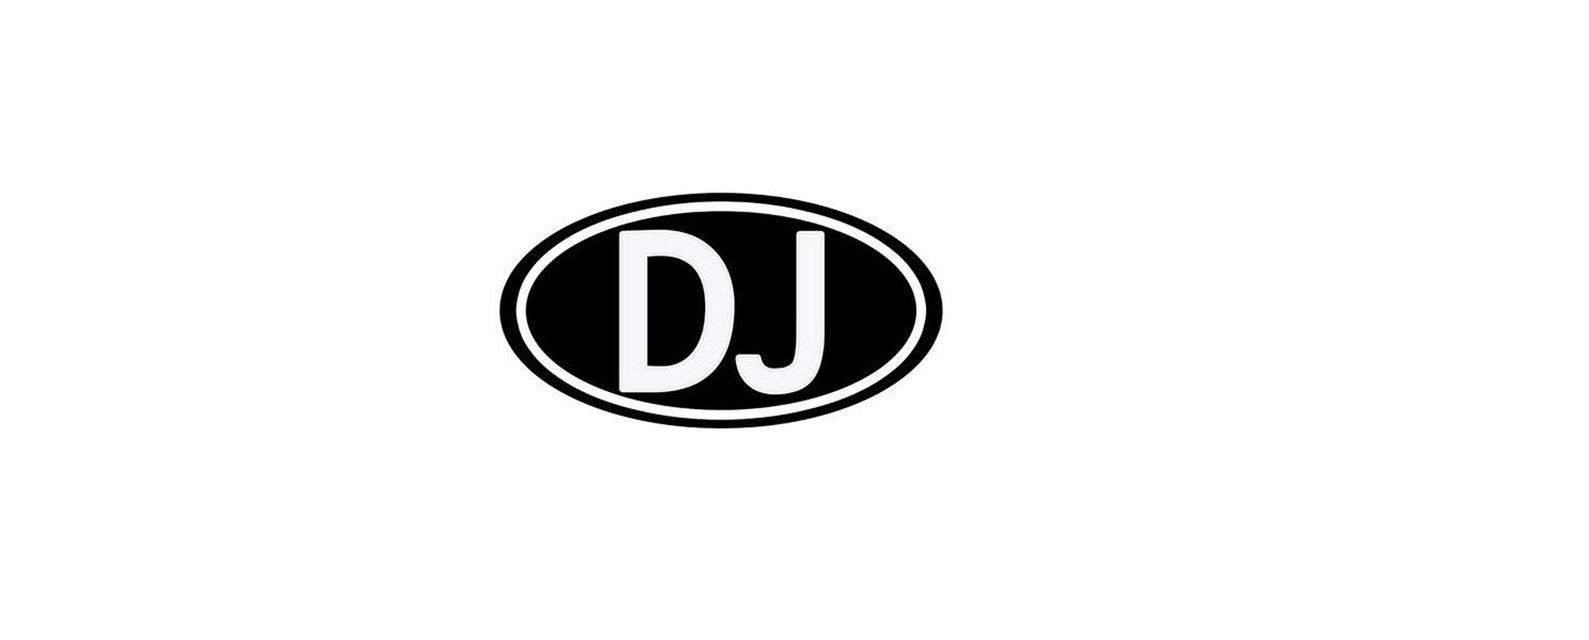 12-5-cm-6-6-cm-personalidad-letras-dj-music-window-Decal-sticker-C5-1168.jpg_640x640